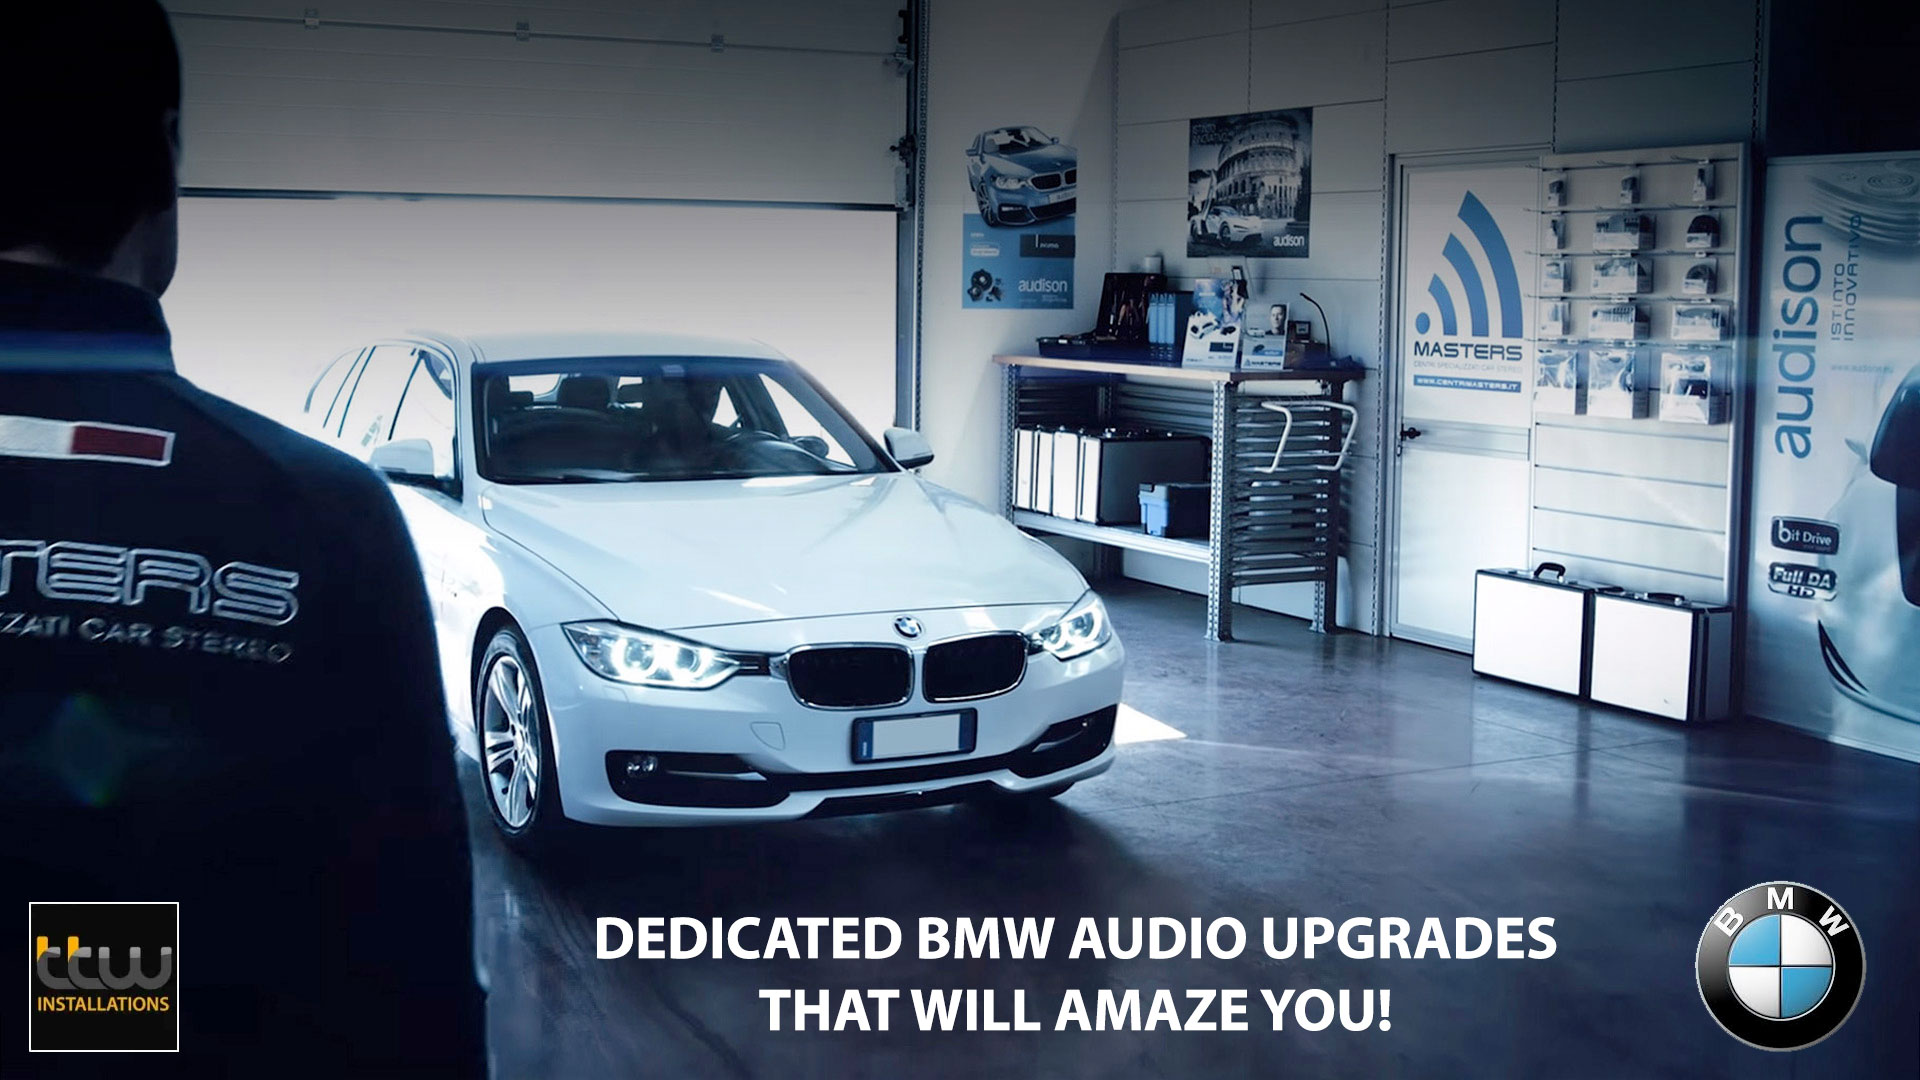 Audison BMW - MINI - Car Audio Upgrades - OEM Solutions - TTW